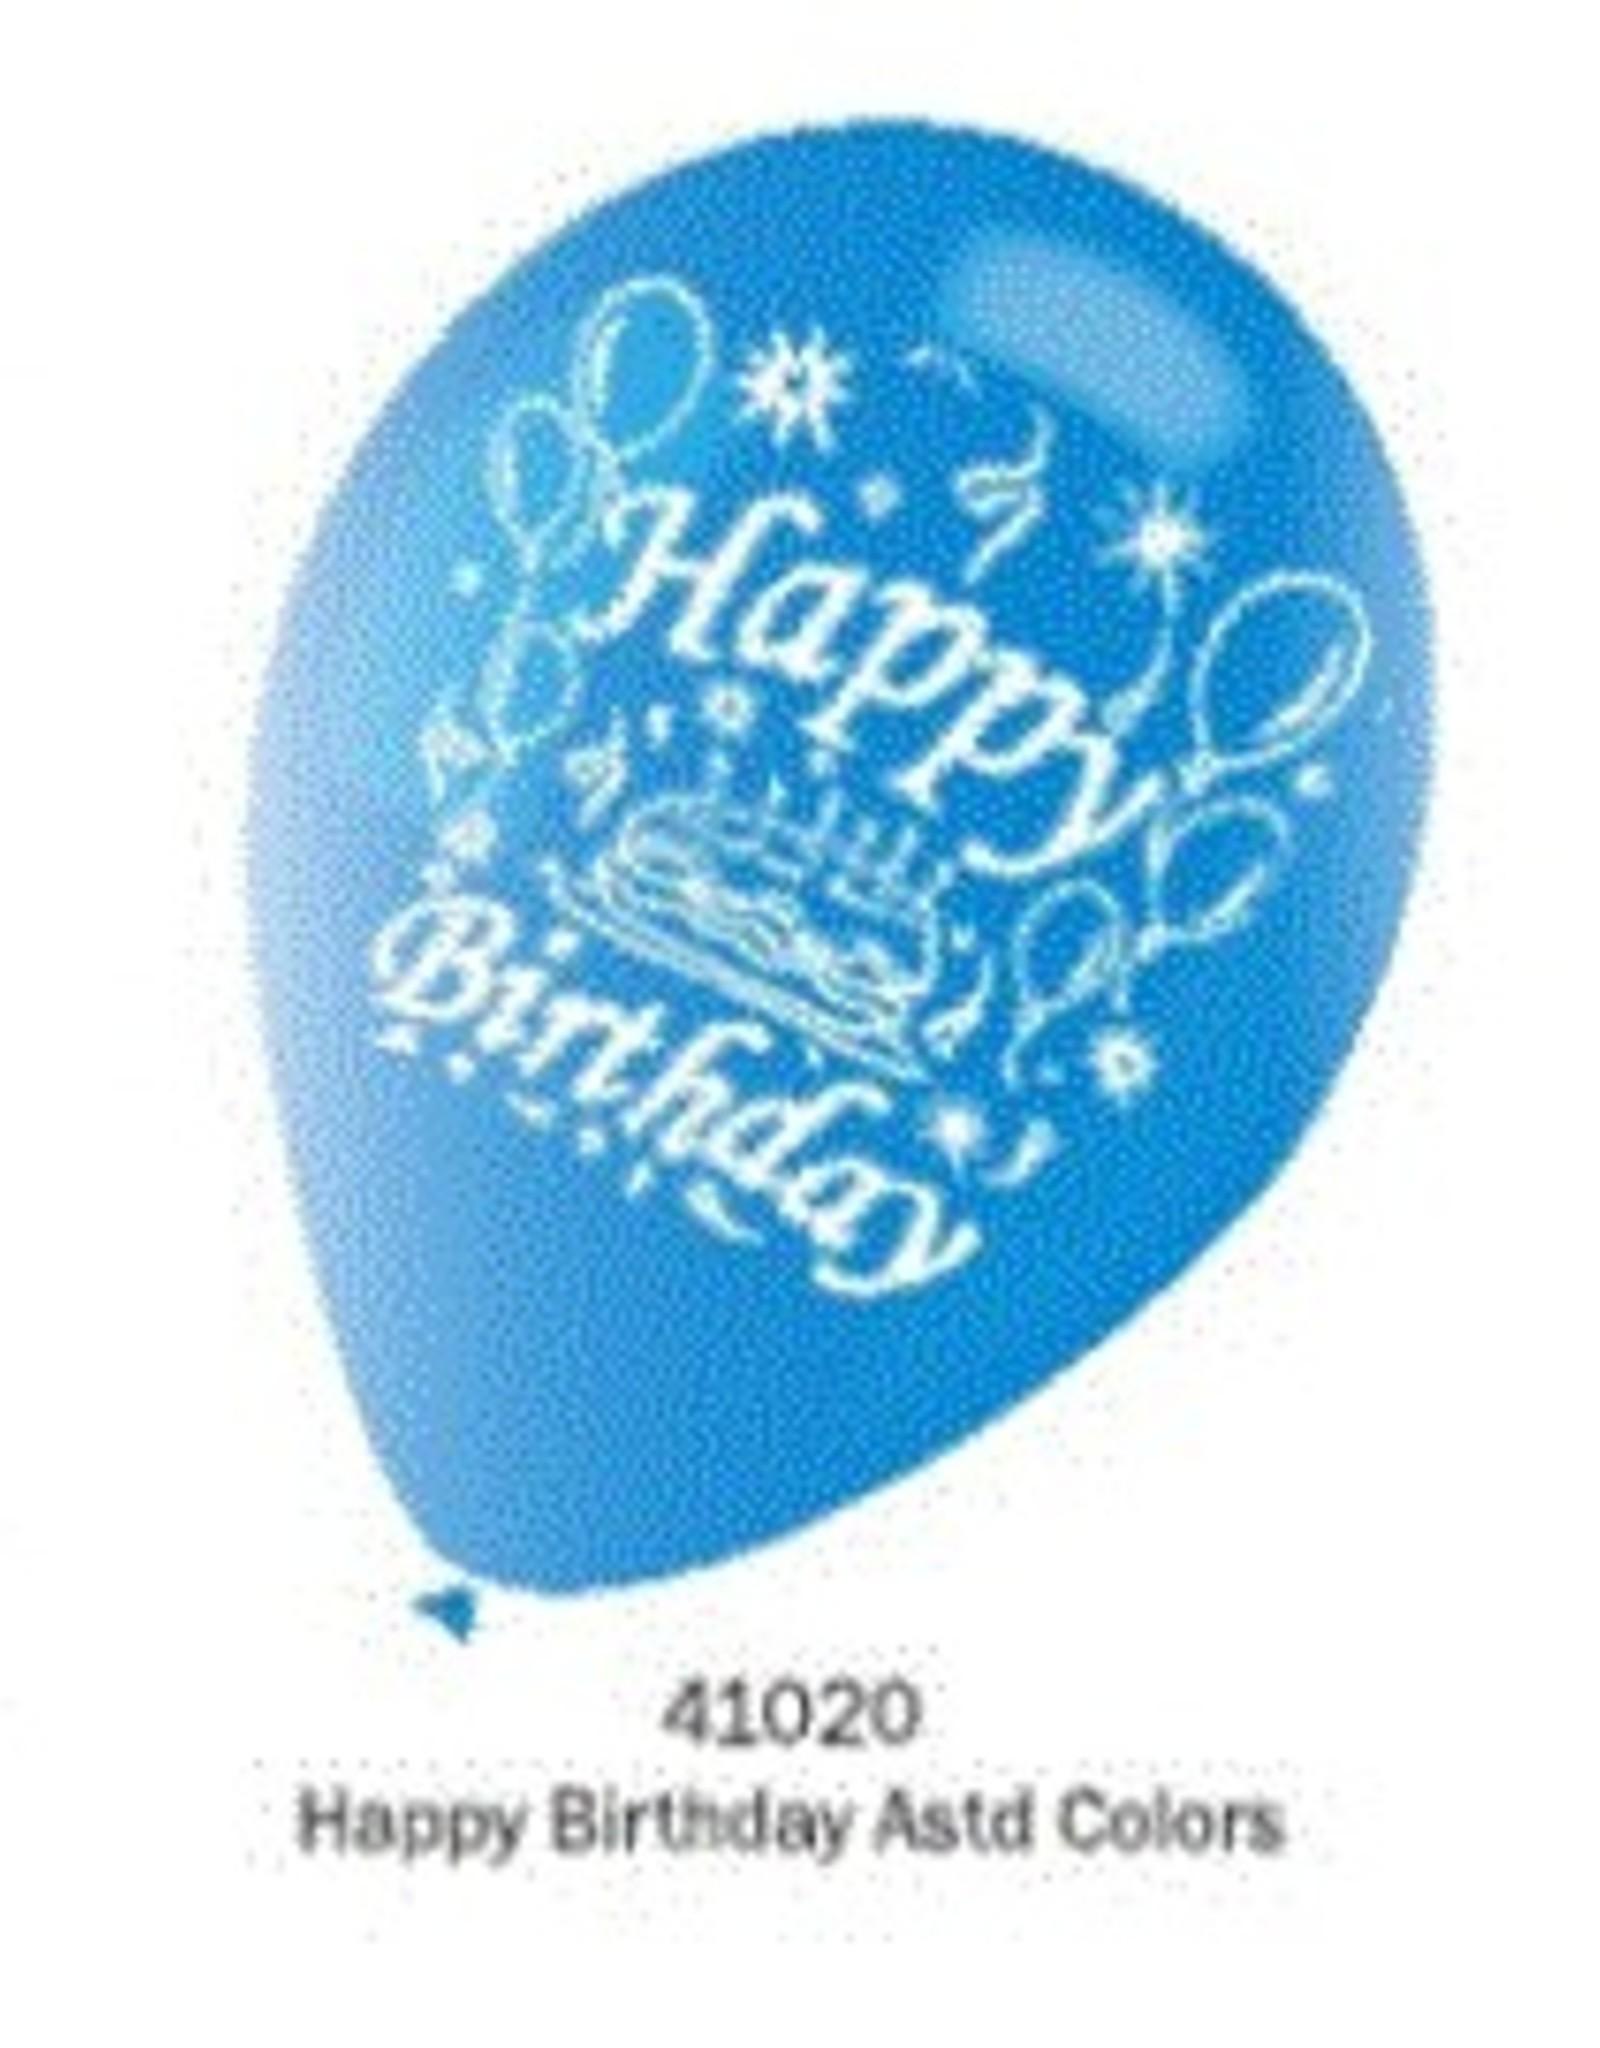 Balloons-10 Pk-Happy Birthday 12Inches Round